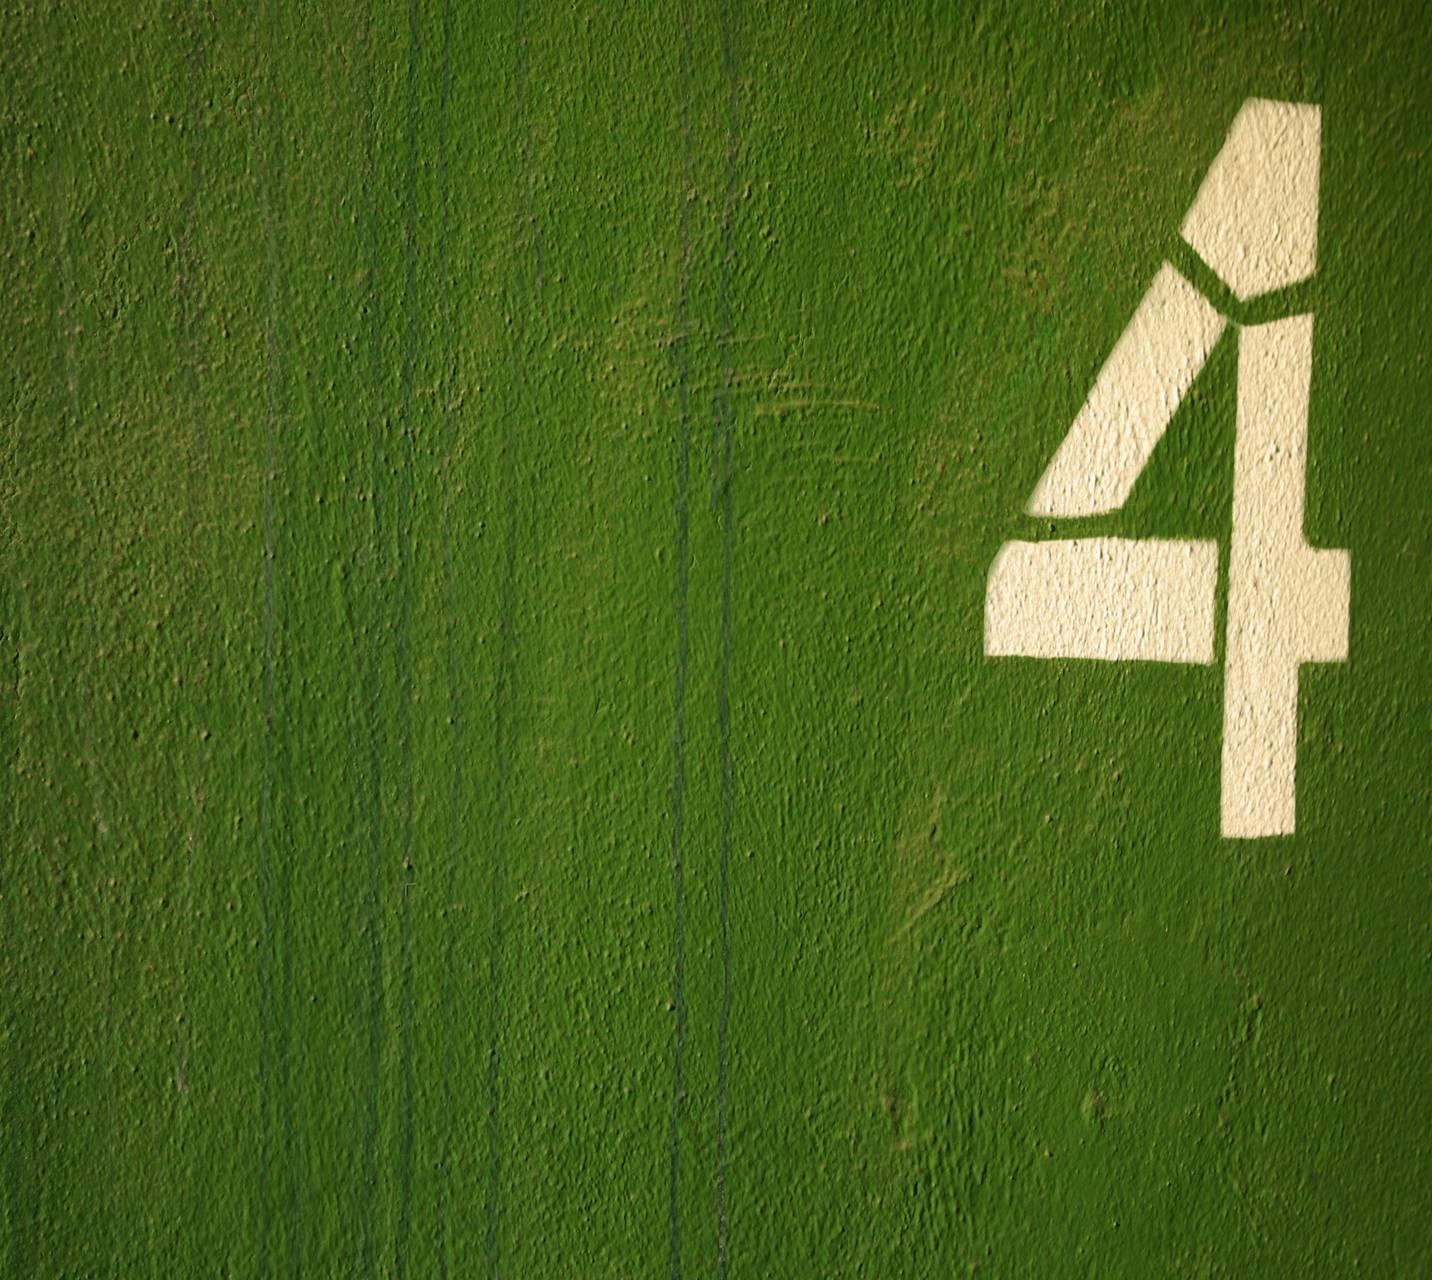 Four green